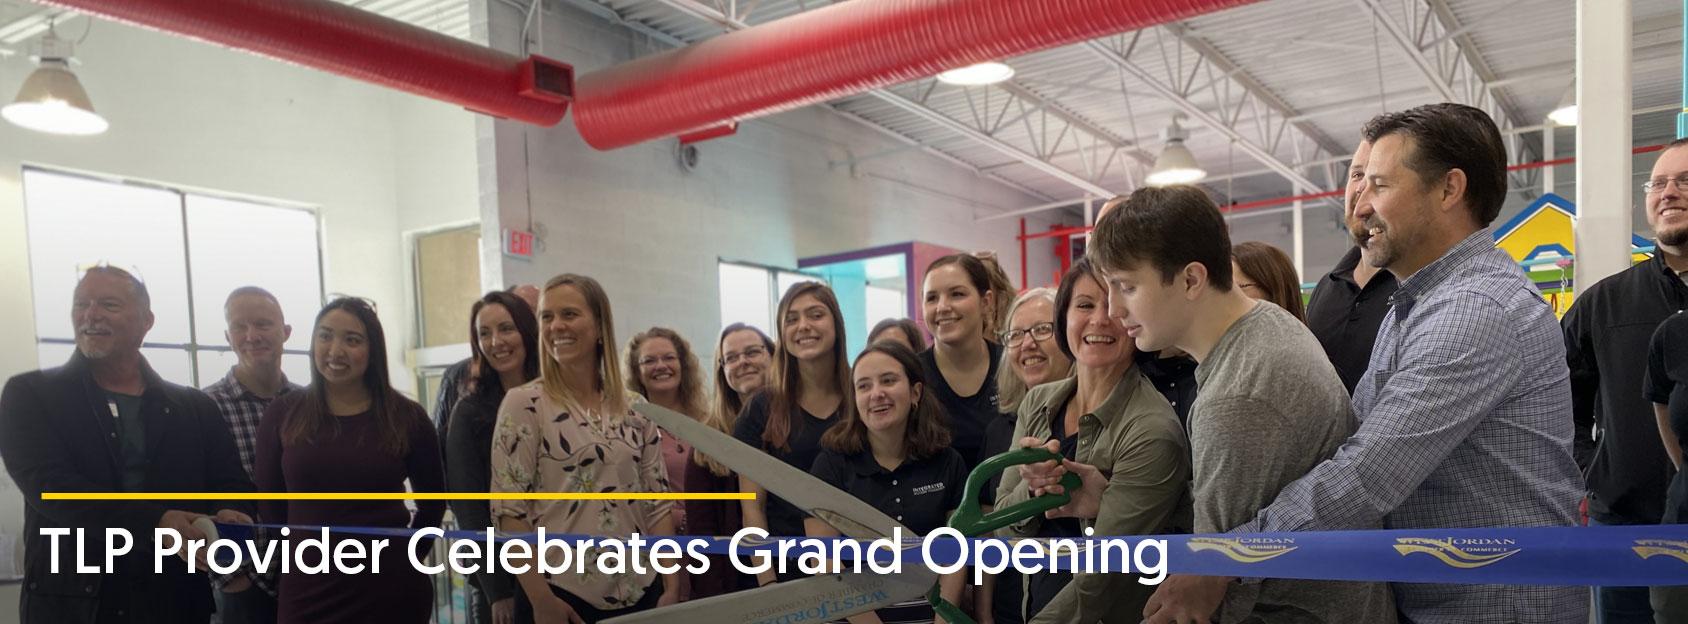 tlp-provider-celebrates-grand-opening-jpg